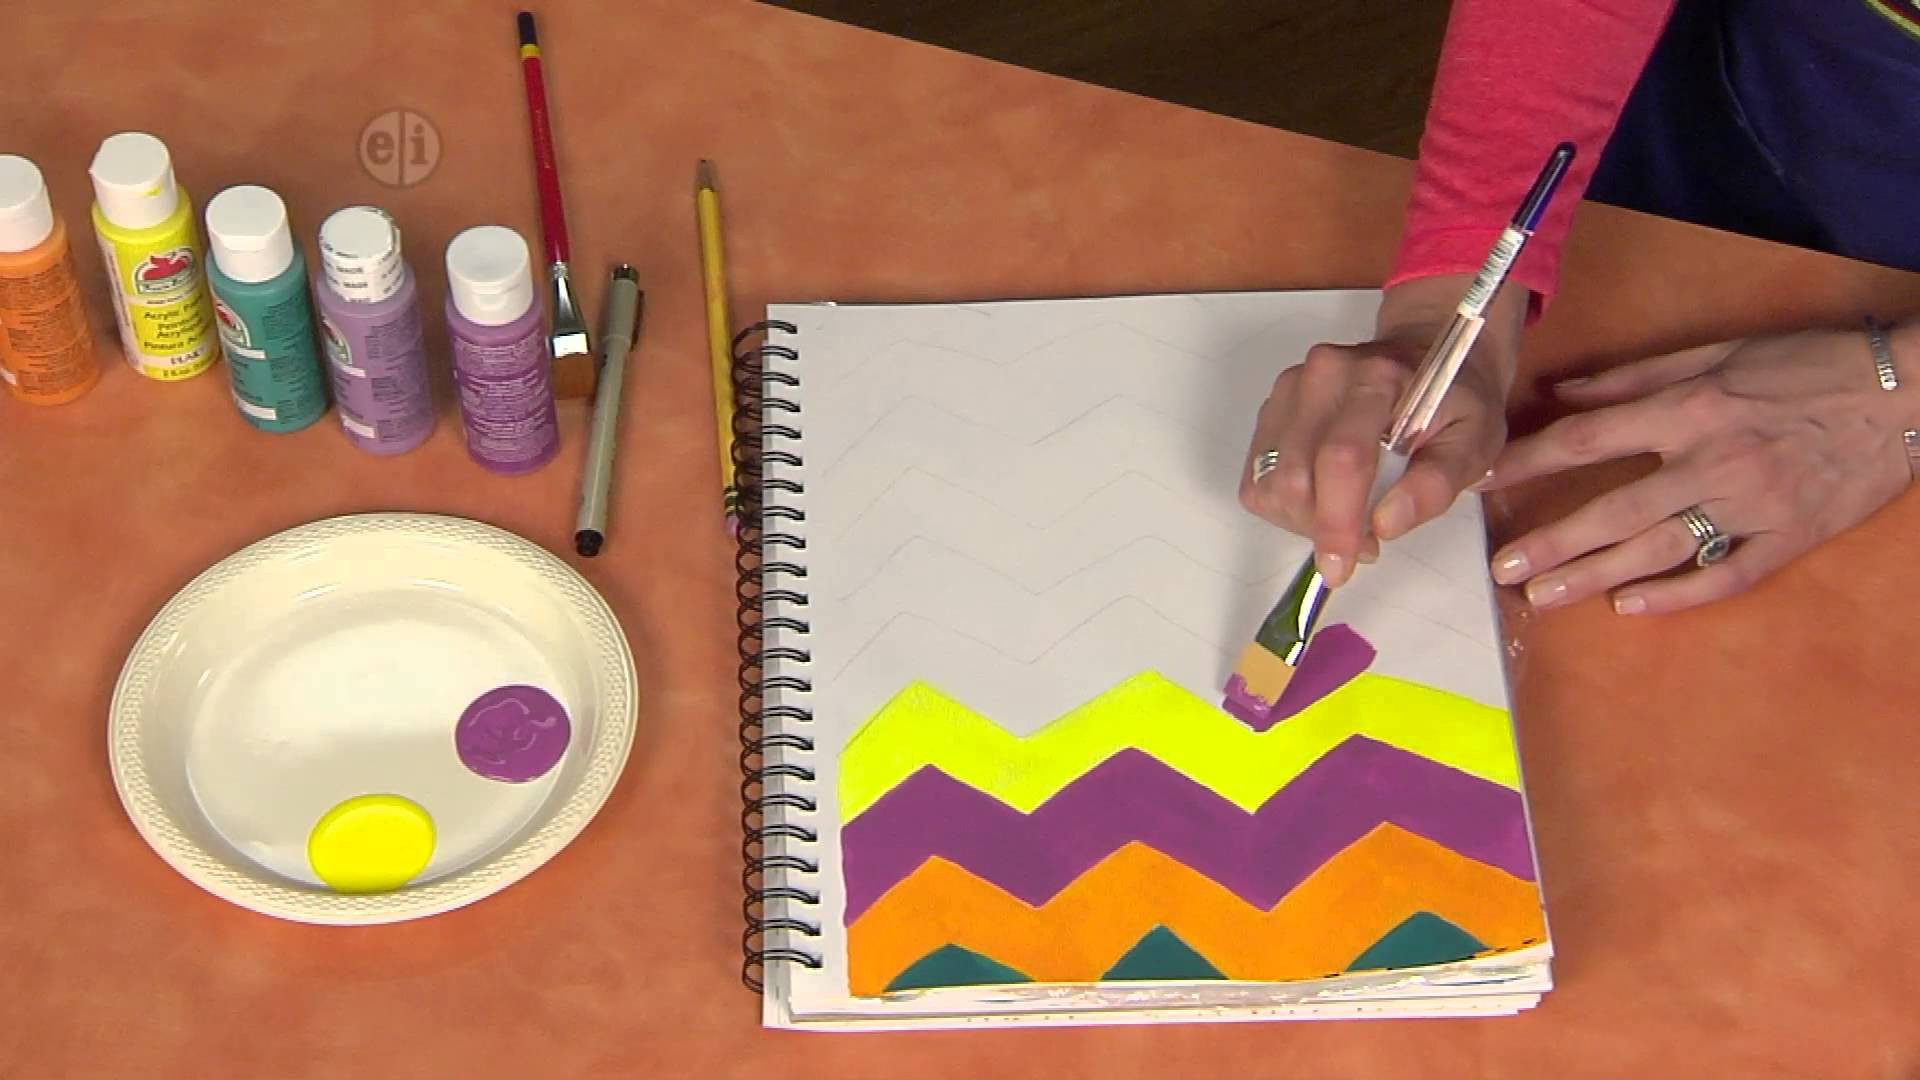 Hands On Crafts for Kids Show Episode 1605-3